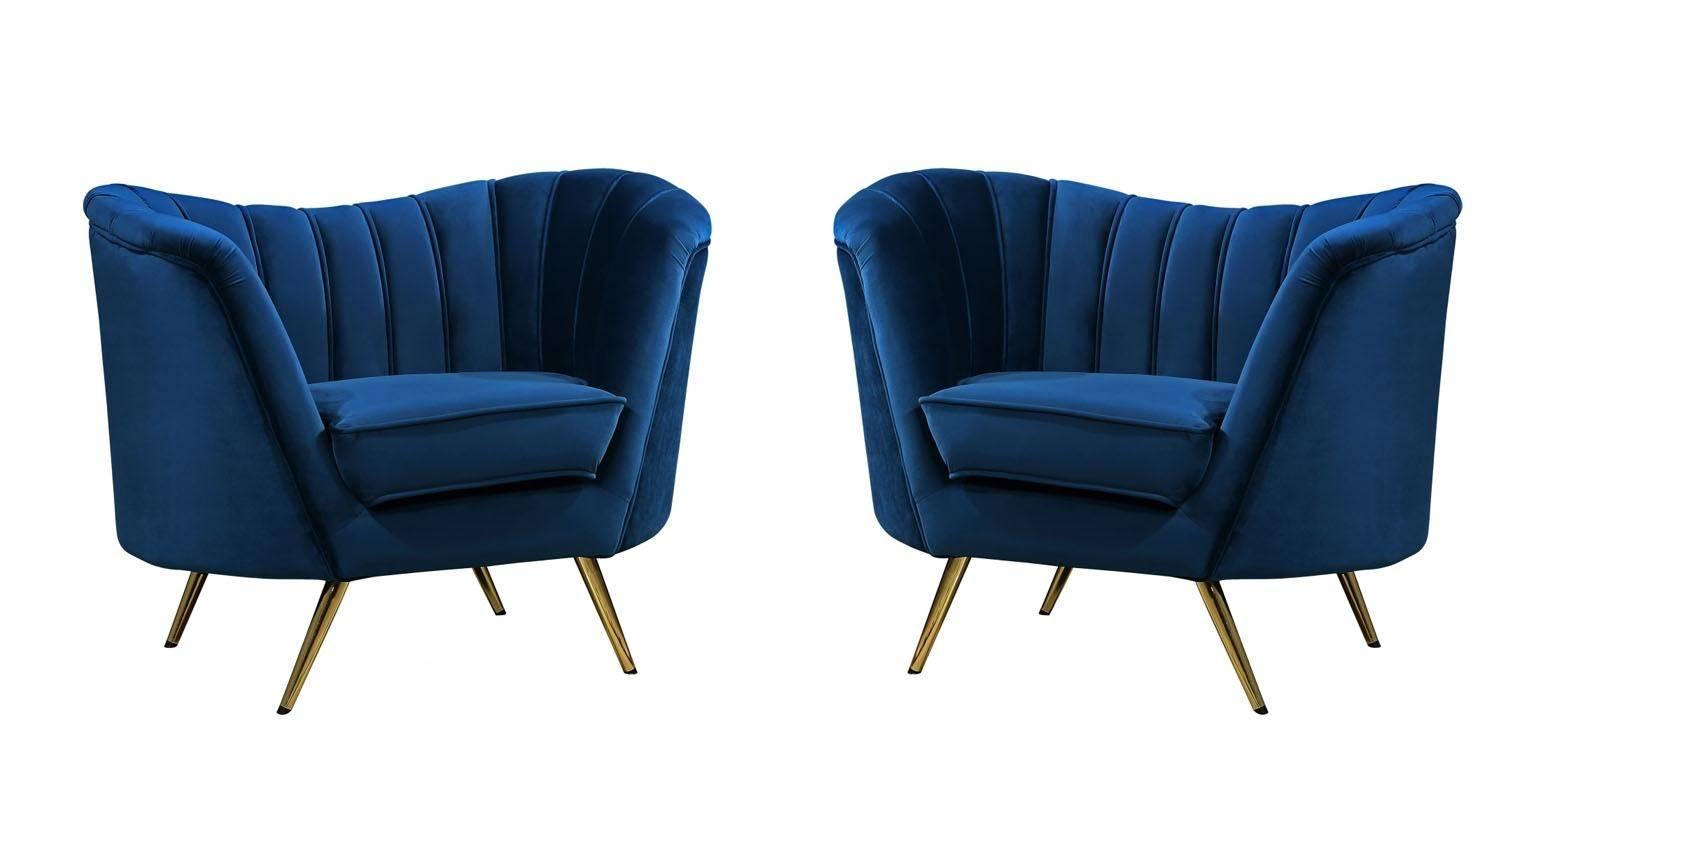 Picture of: Buy Meridian Margo 622 Accent Chair 2 Pcs In Navy Blue Velvet Online